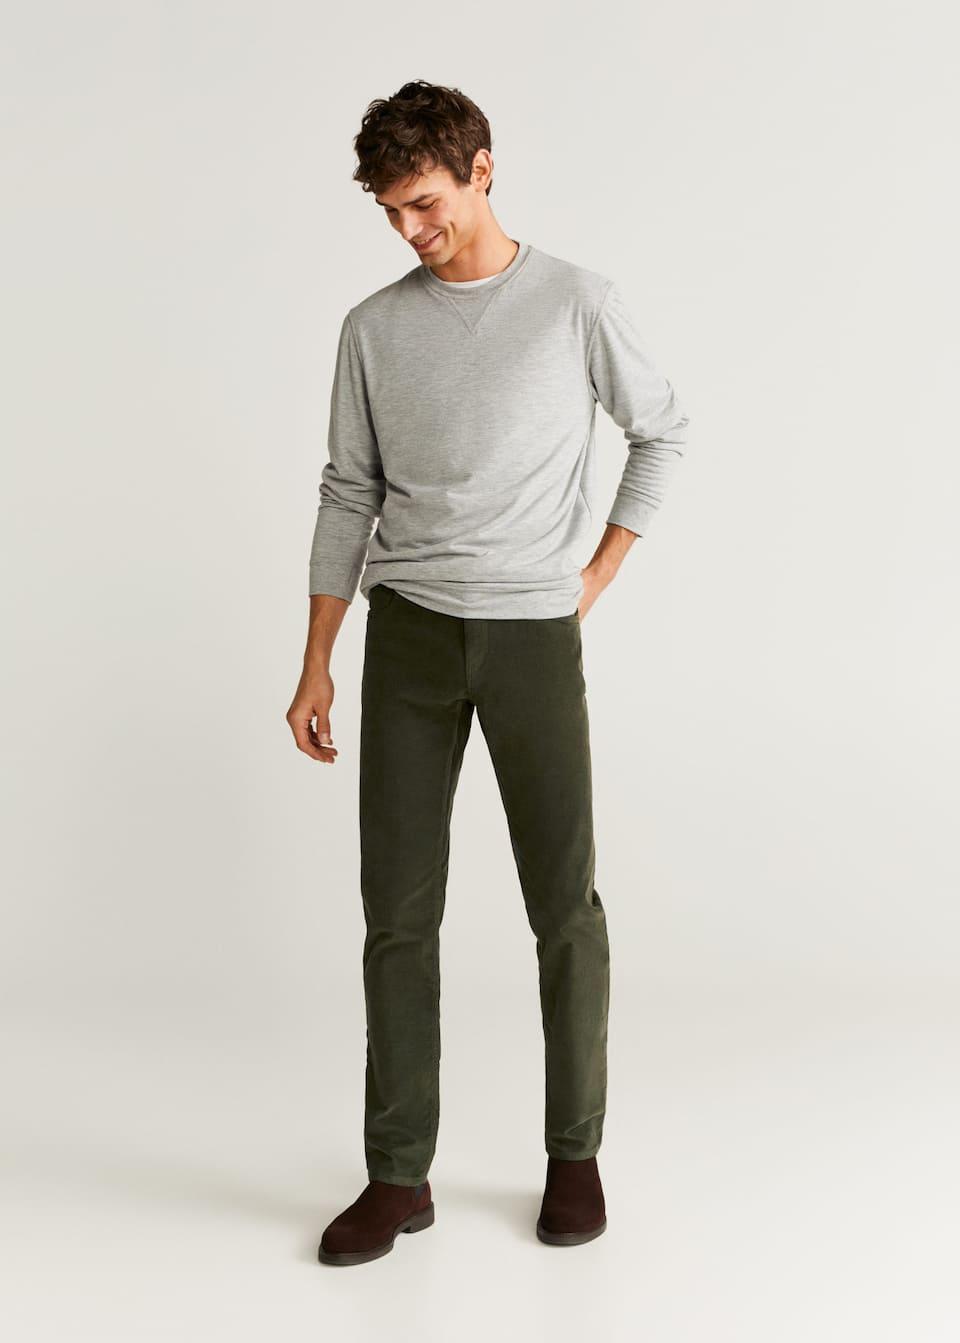 trouser trends